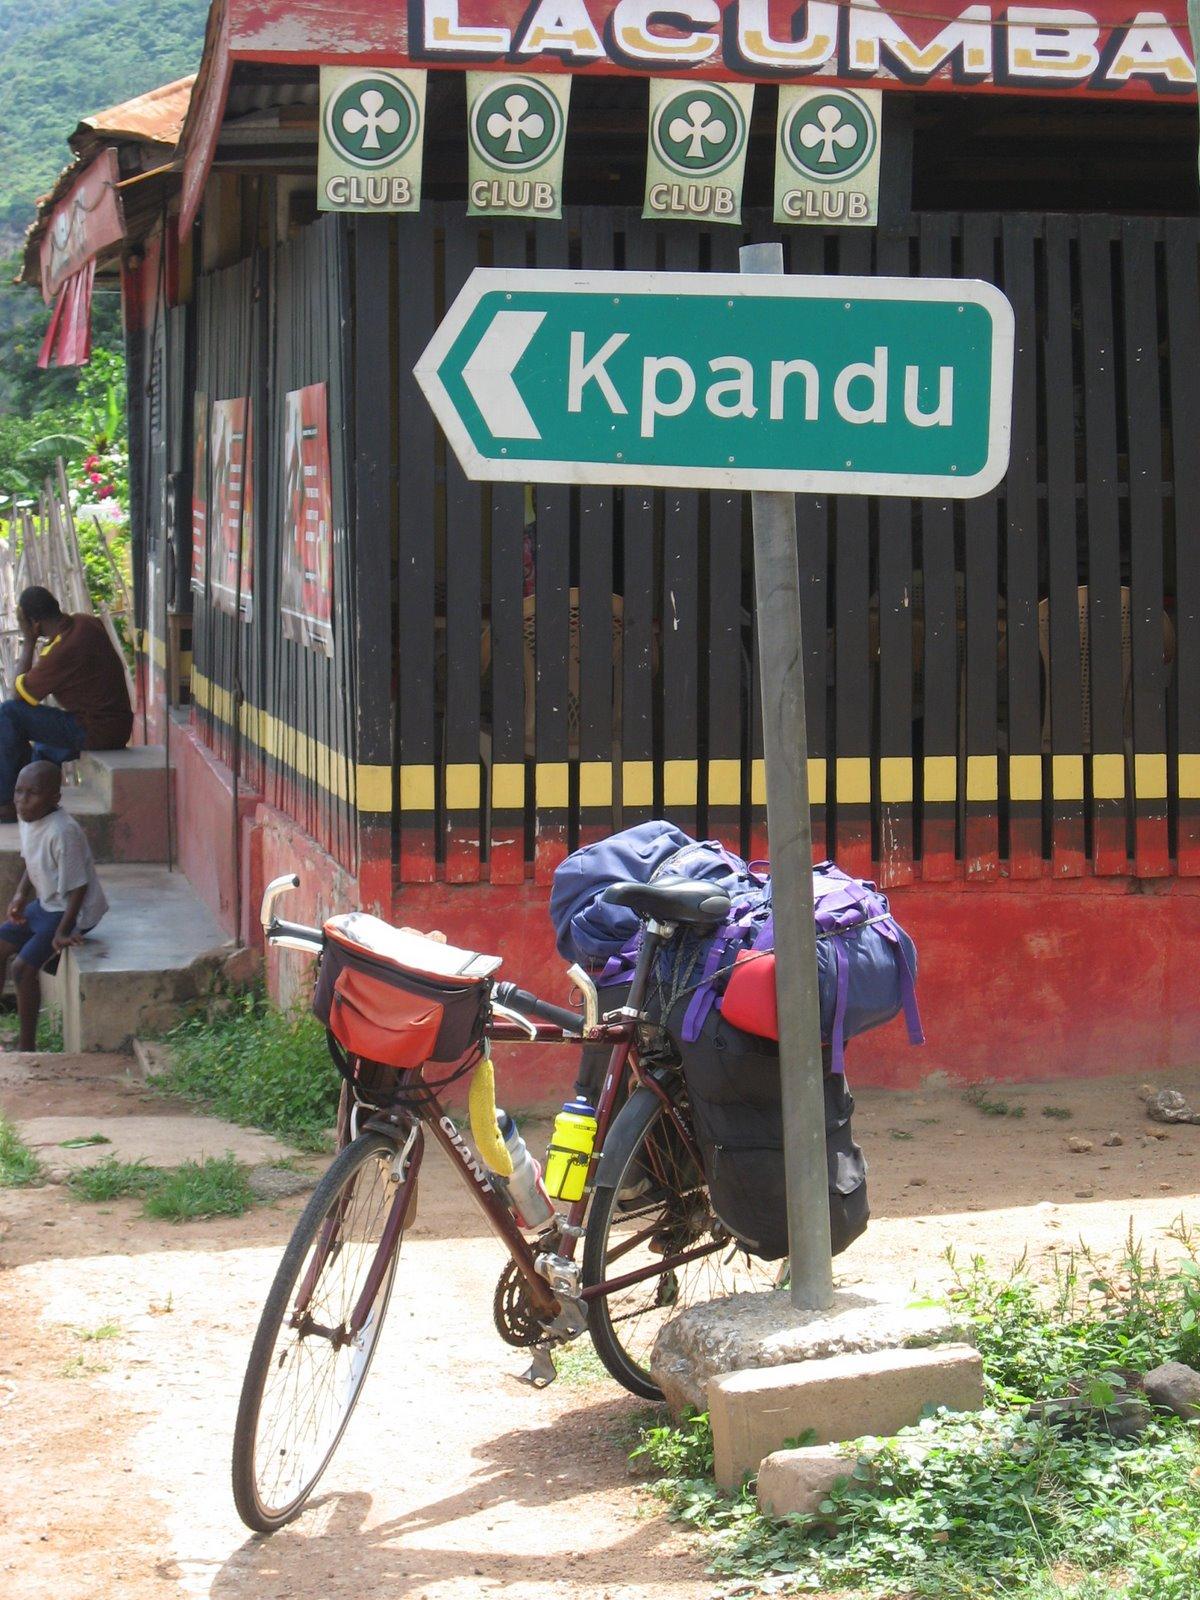 Waarom Kpando, waarom Ghana?